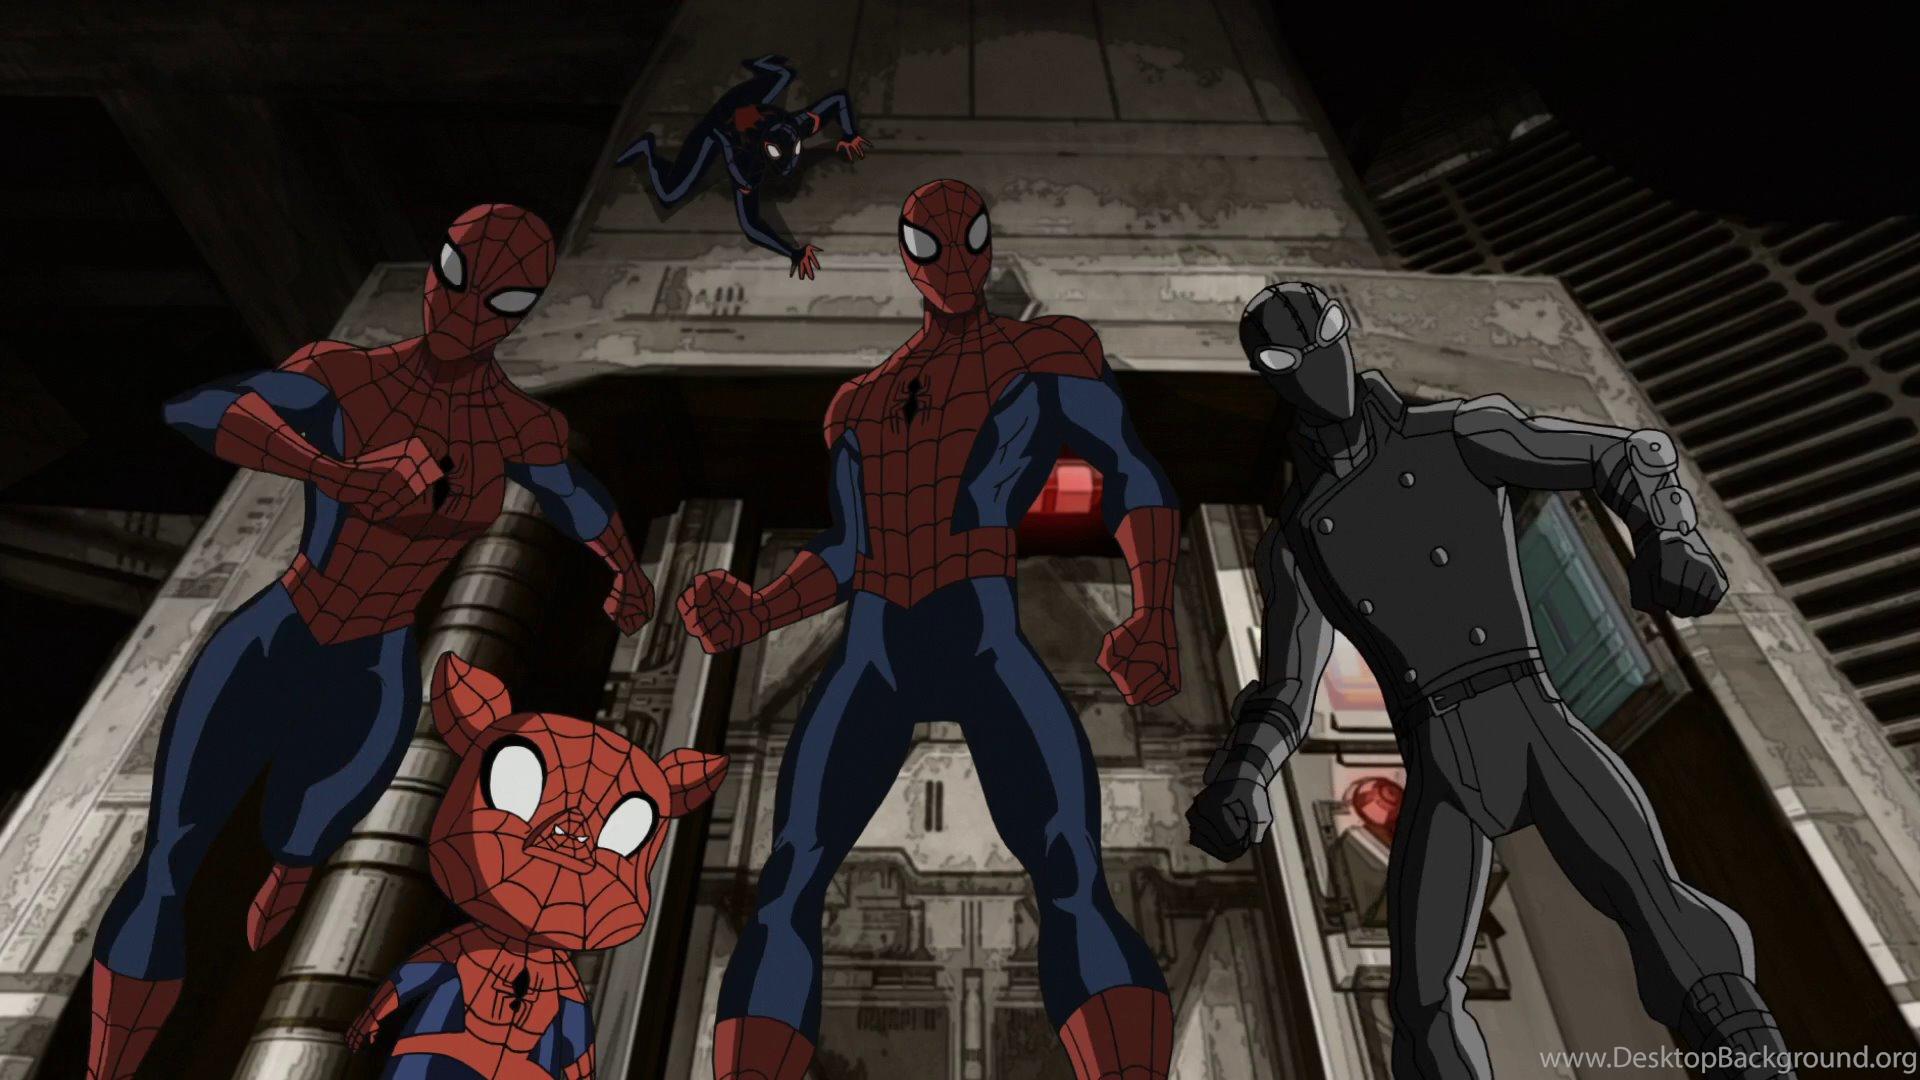 Image Spider Man Spider Girl Spider Ham Miles Morales Spider Man